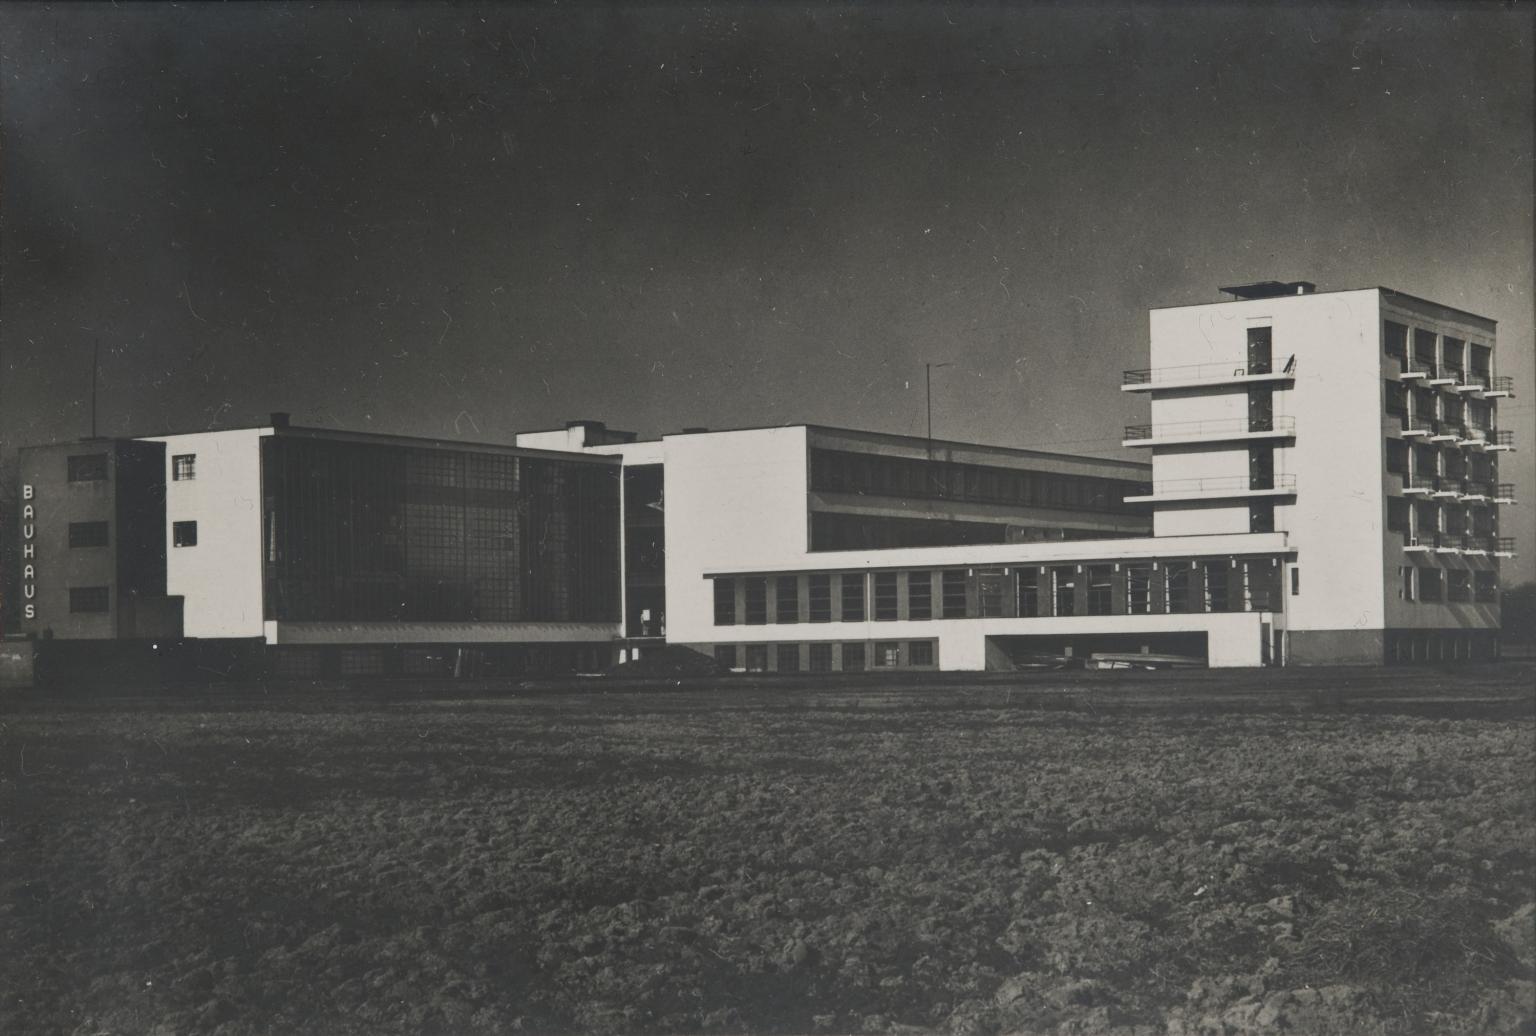 Tocho t8 lucia shulz moholy 1894 1989 bauhaus o a la for Bauhaus haus